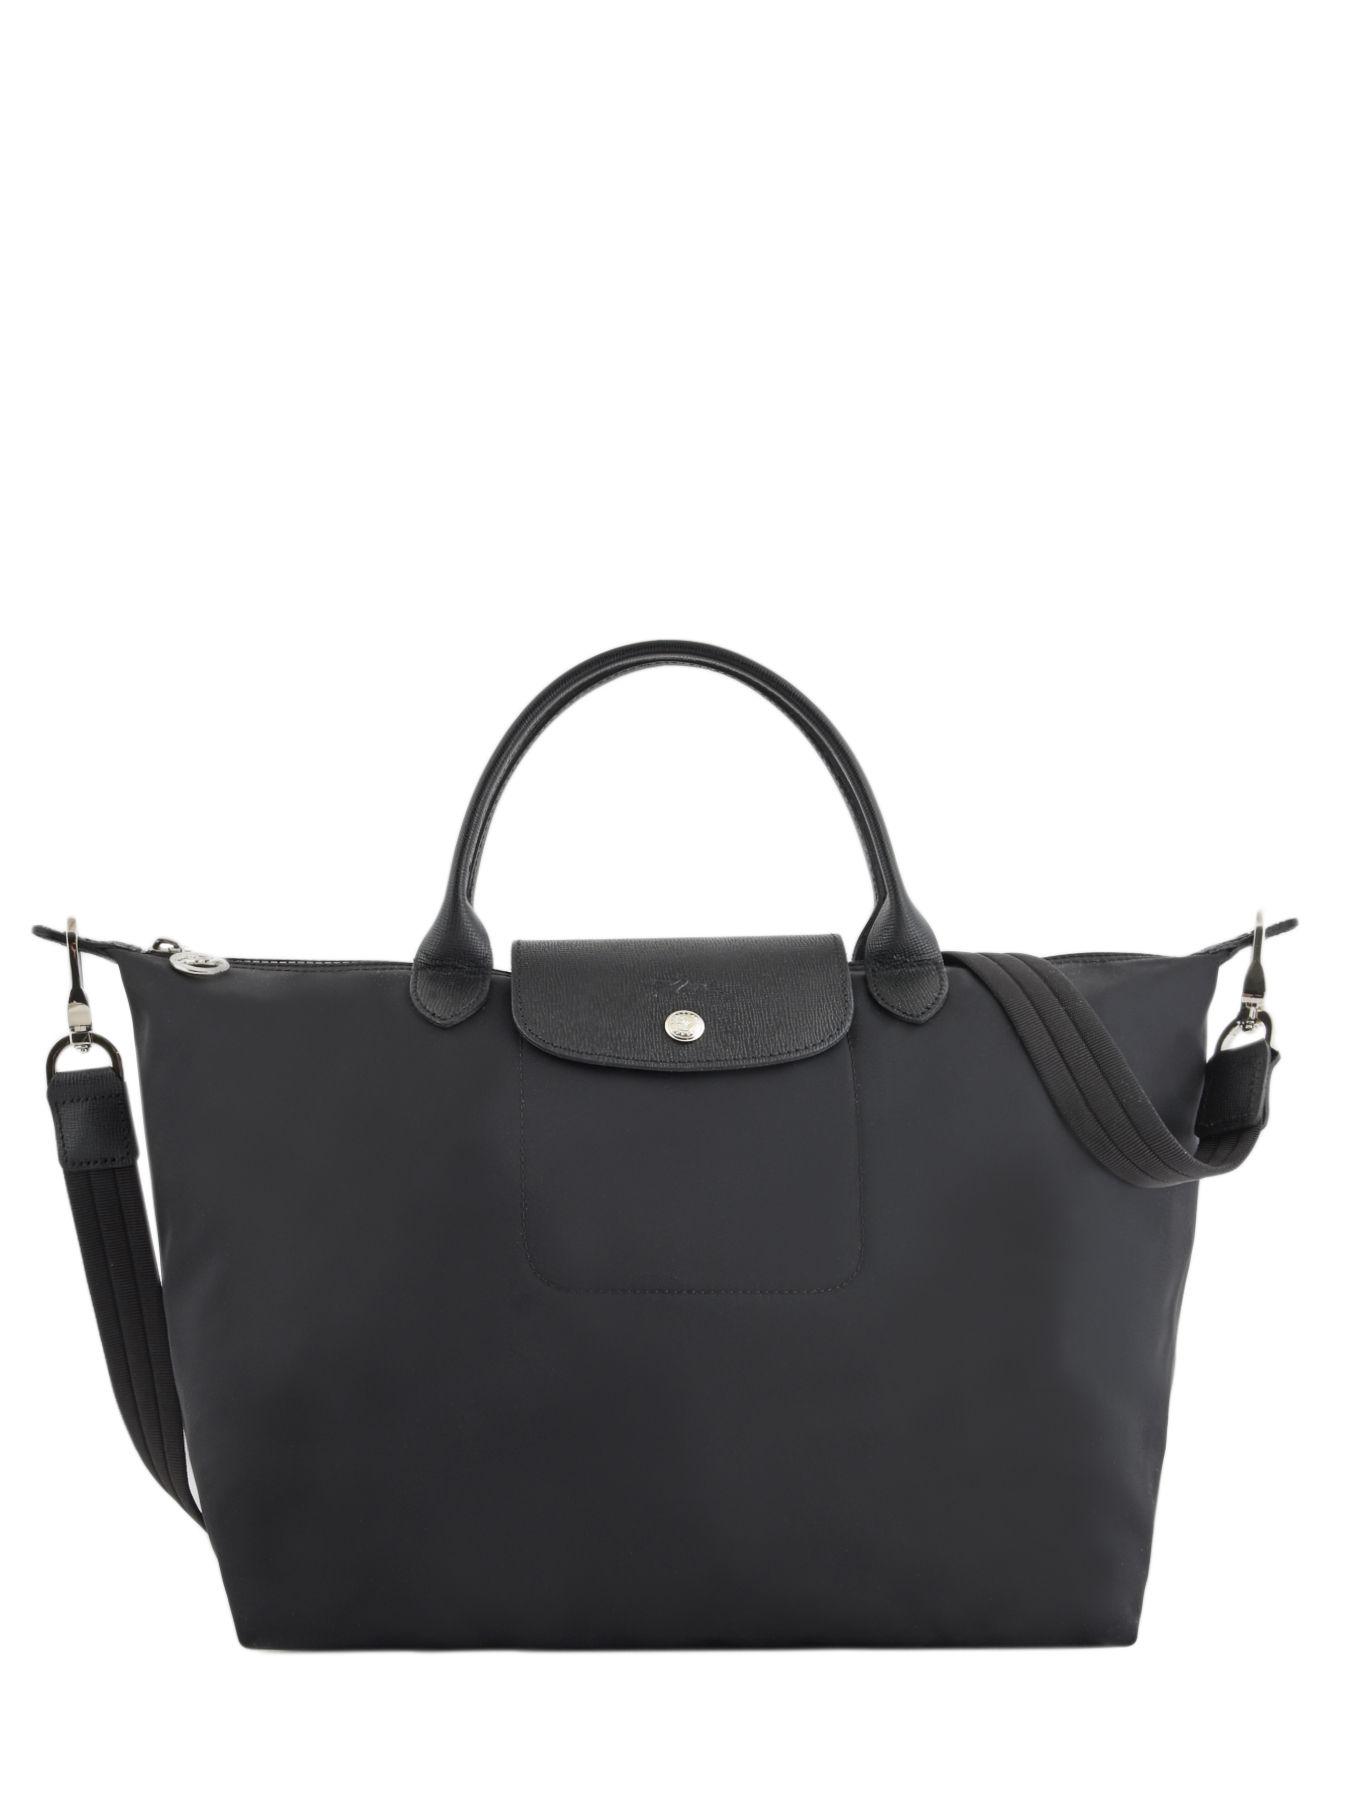 sac longchamp en toile noir